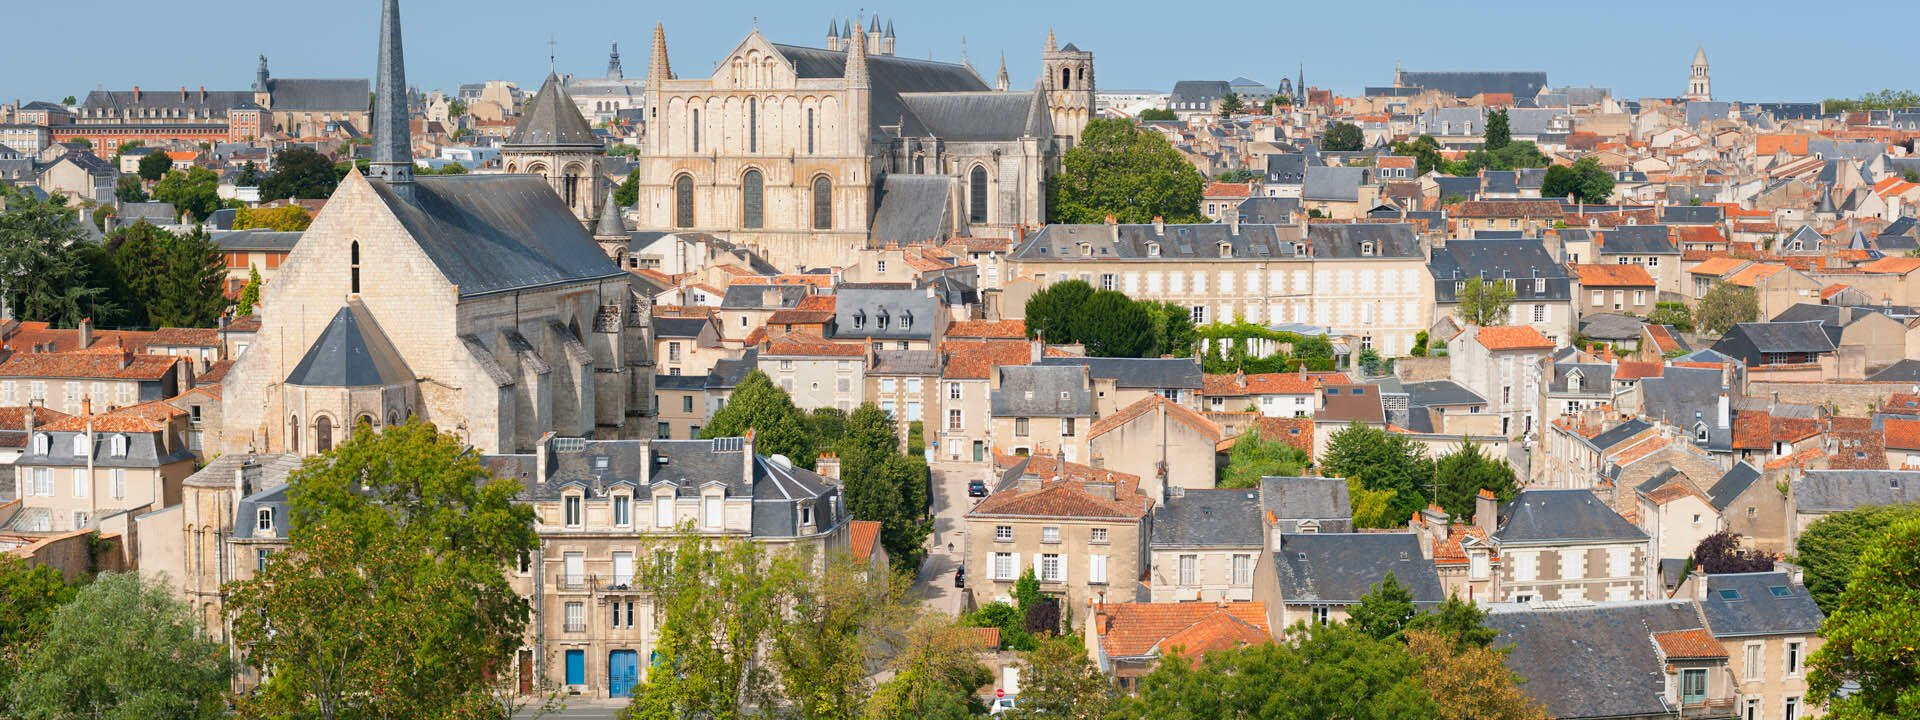 Your travel guide to Poitou Charentes